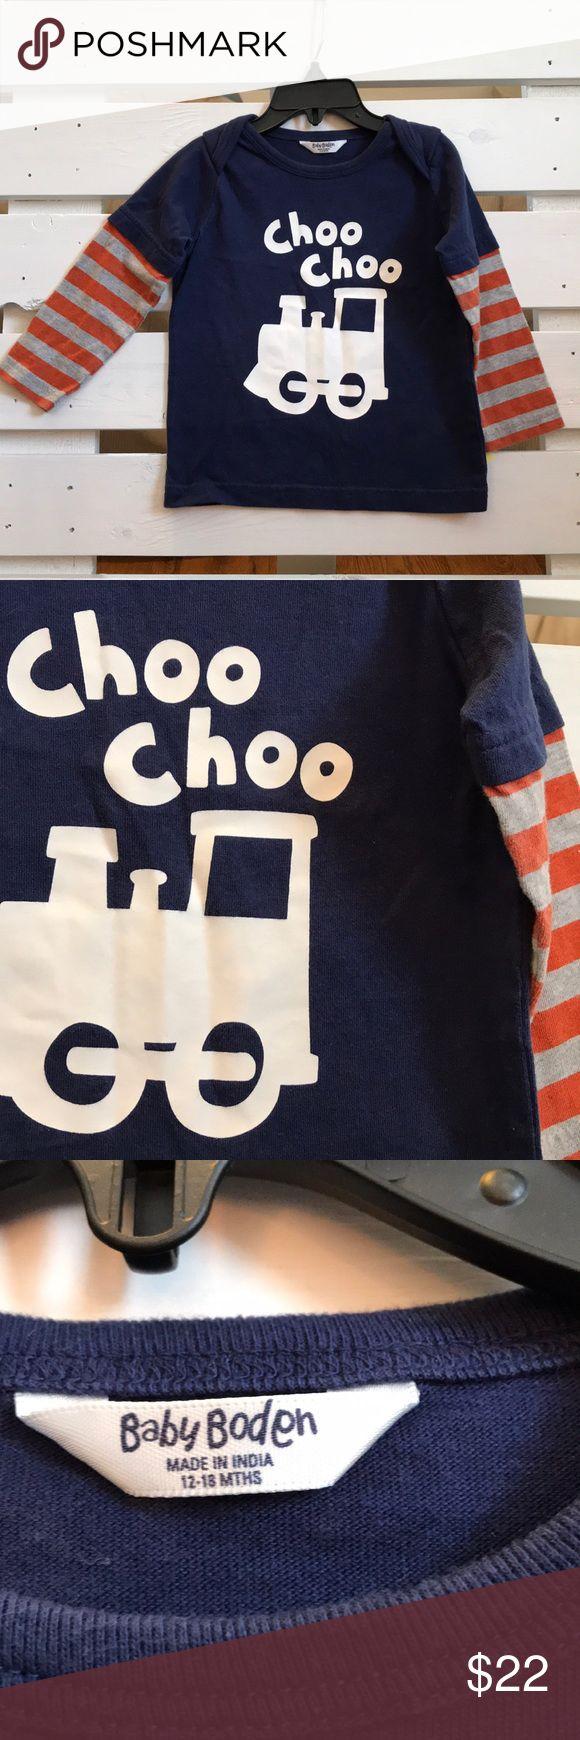 BABY BODEN Boys Choo Choo Train Long Sleeve 12-18m Baby Boden boys Choo Choo train long sleeve. Good condition! Smoke and pet free home. Mini Boden Shirts & Tops Tees - Long Sleeve